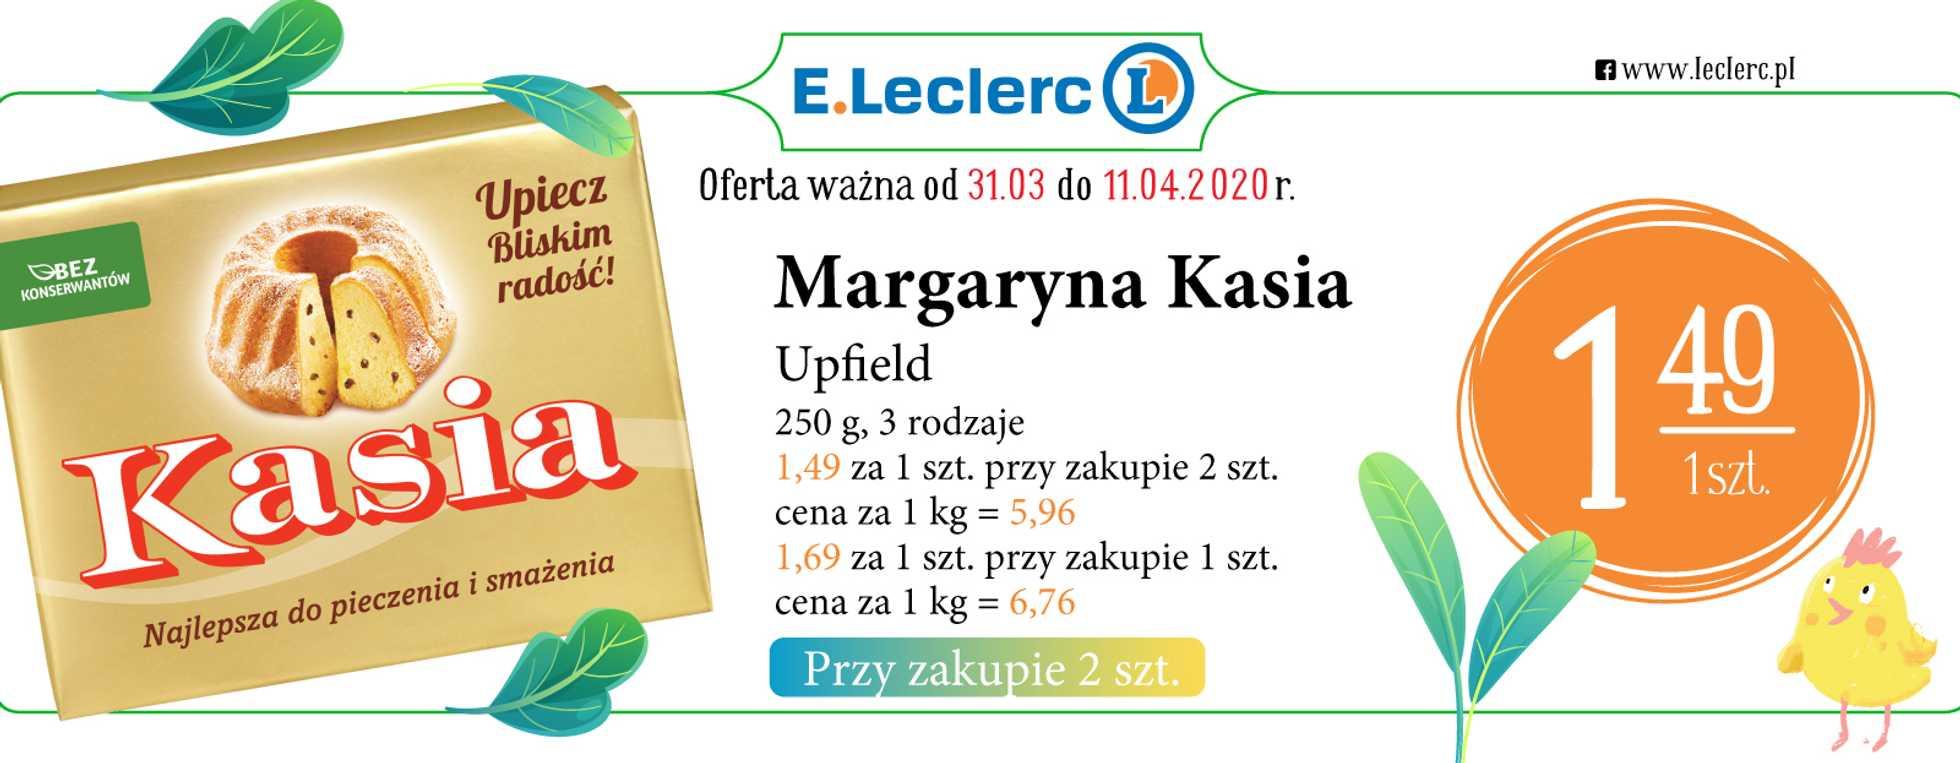 E.Leclerc - gazetka promocyjna ważna od 31.03.2020 do 11.04.2020 - strona 2.